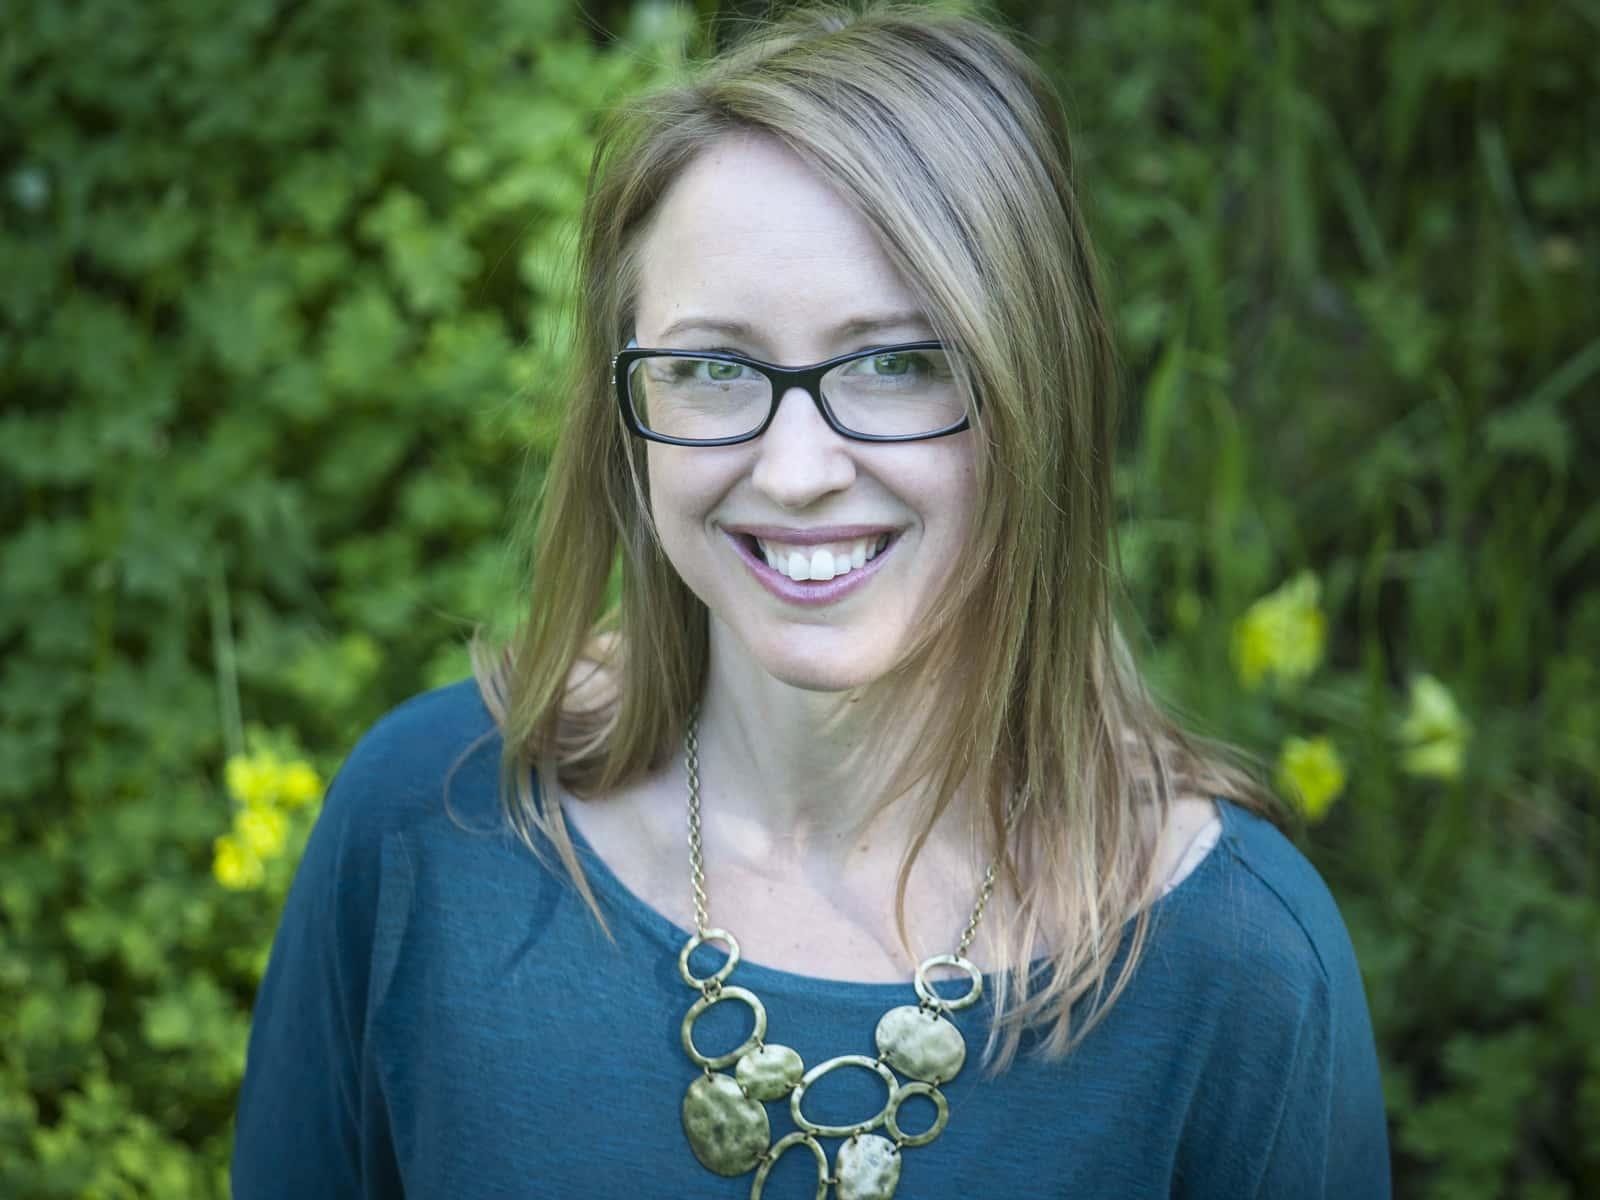 Kristin from San Francisco, California, United States